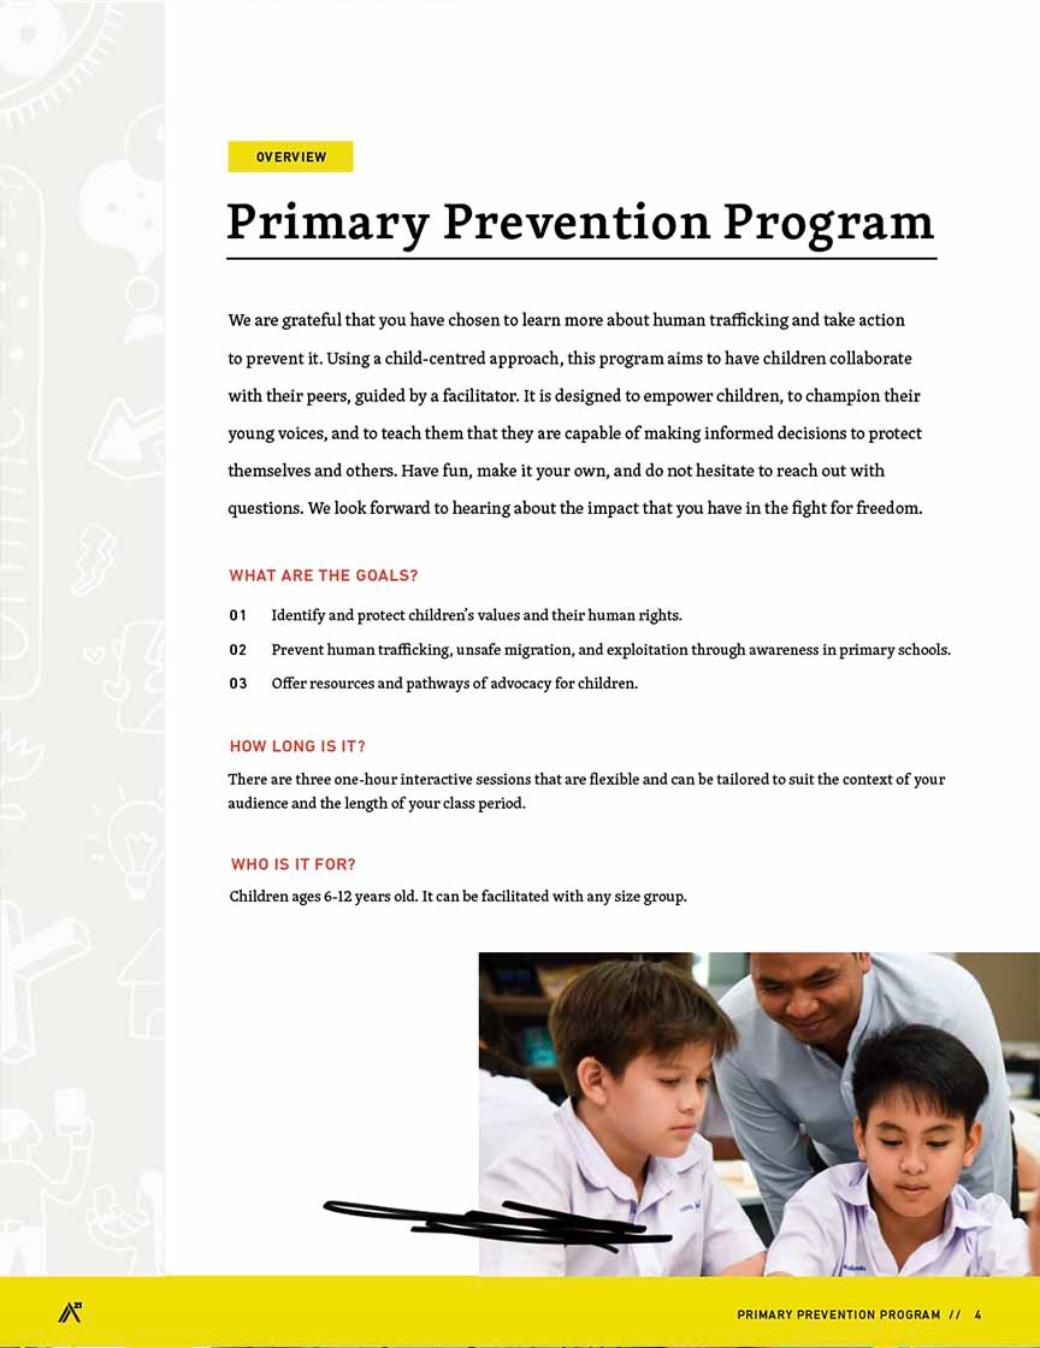 Primary Prevention Program